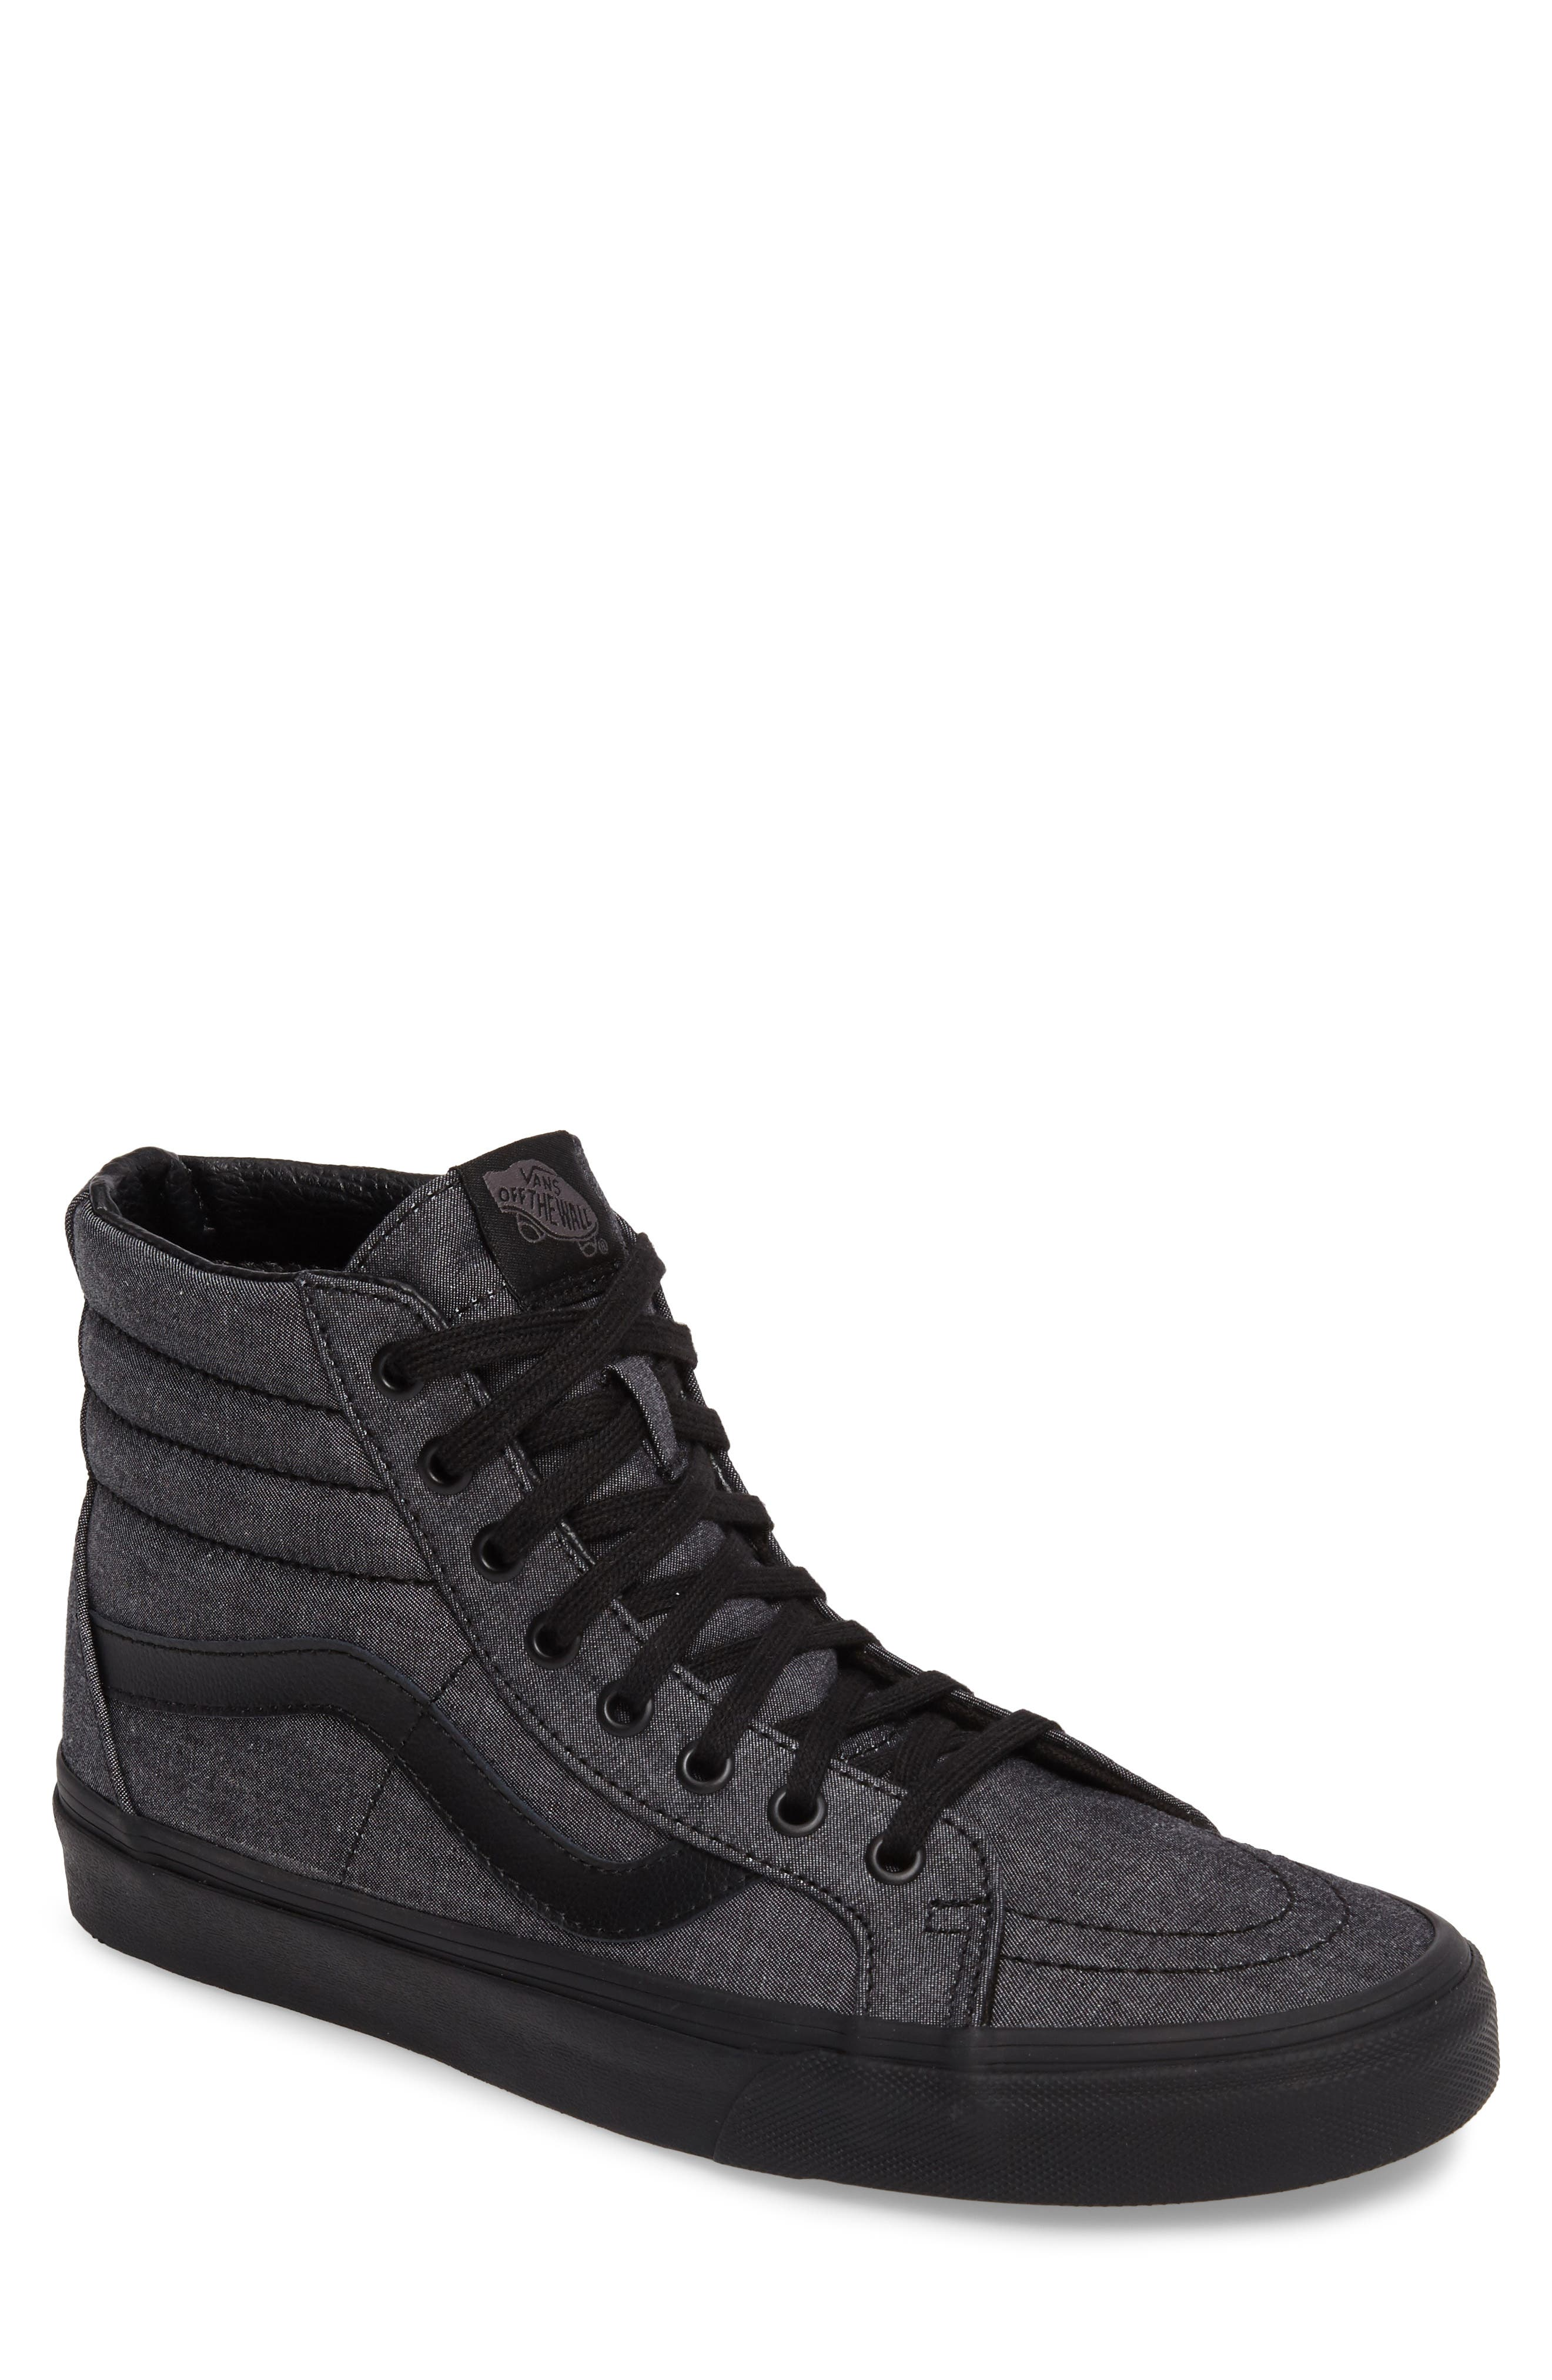 Alternate Image 1 Selected - Vans 'Sk8-HiReissue' Sneaker (Men)